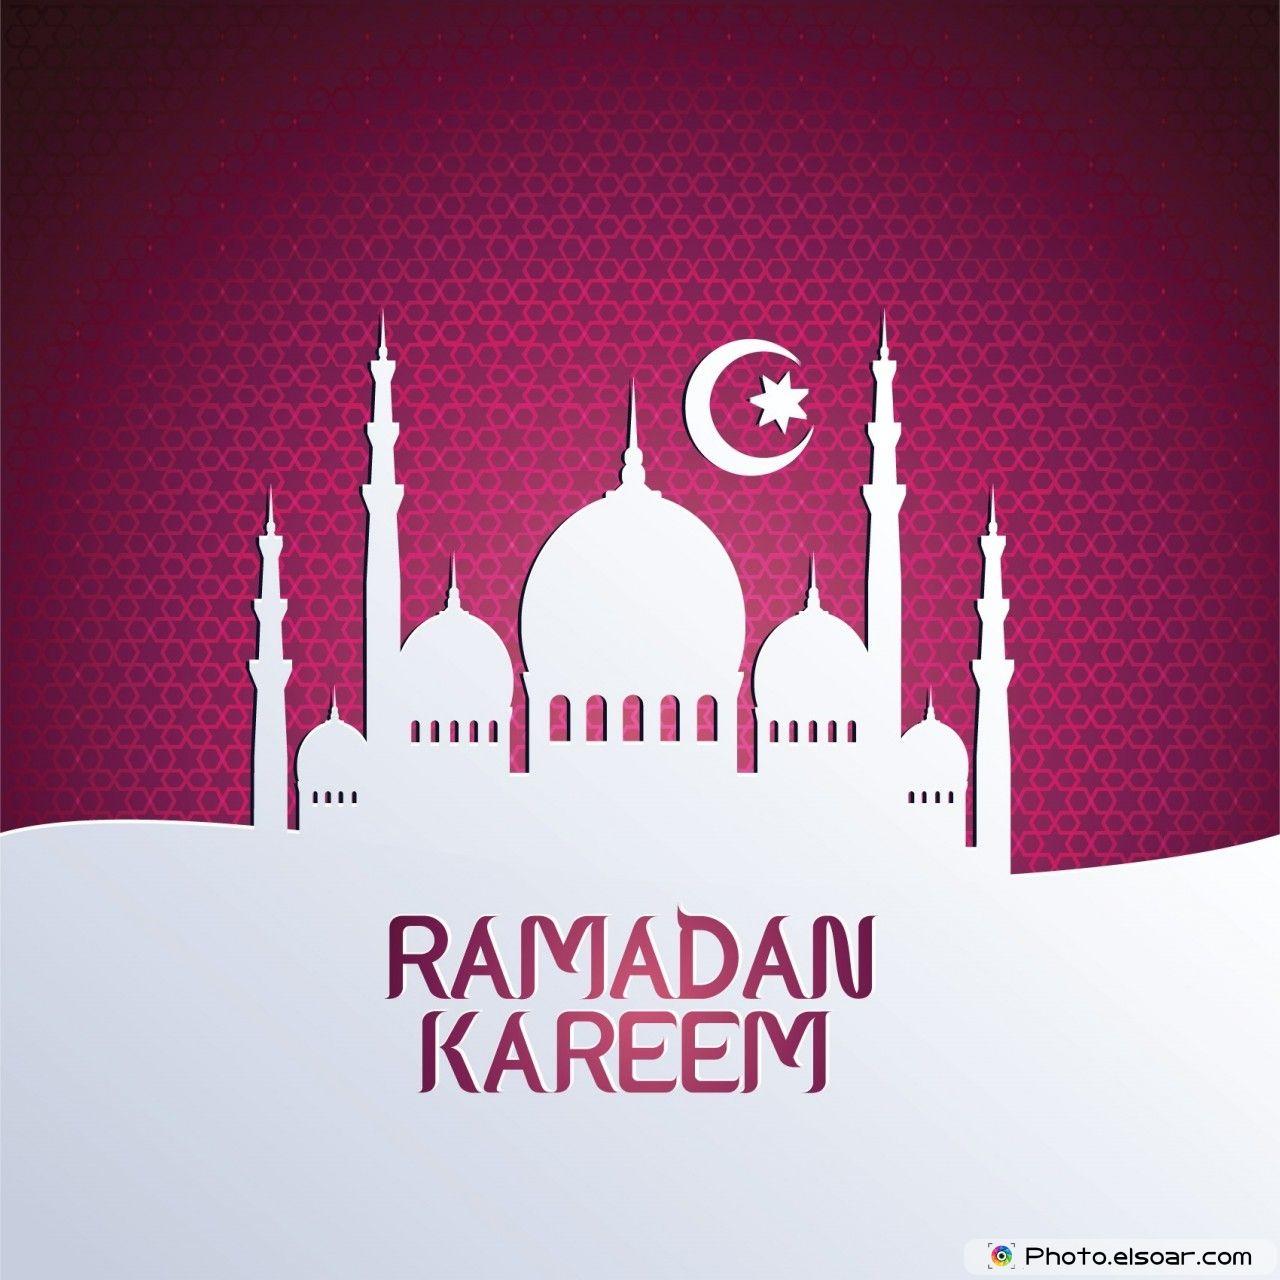 Wallpaper Ramadan Kareem High Definition Ramadan Wallpaper Hd Ramadan Kareem Ramadan